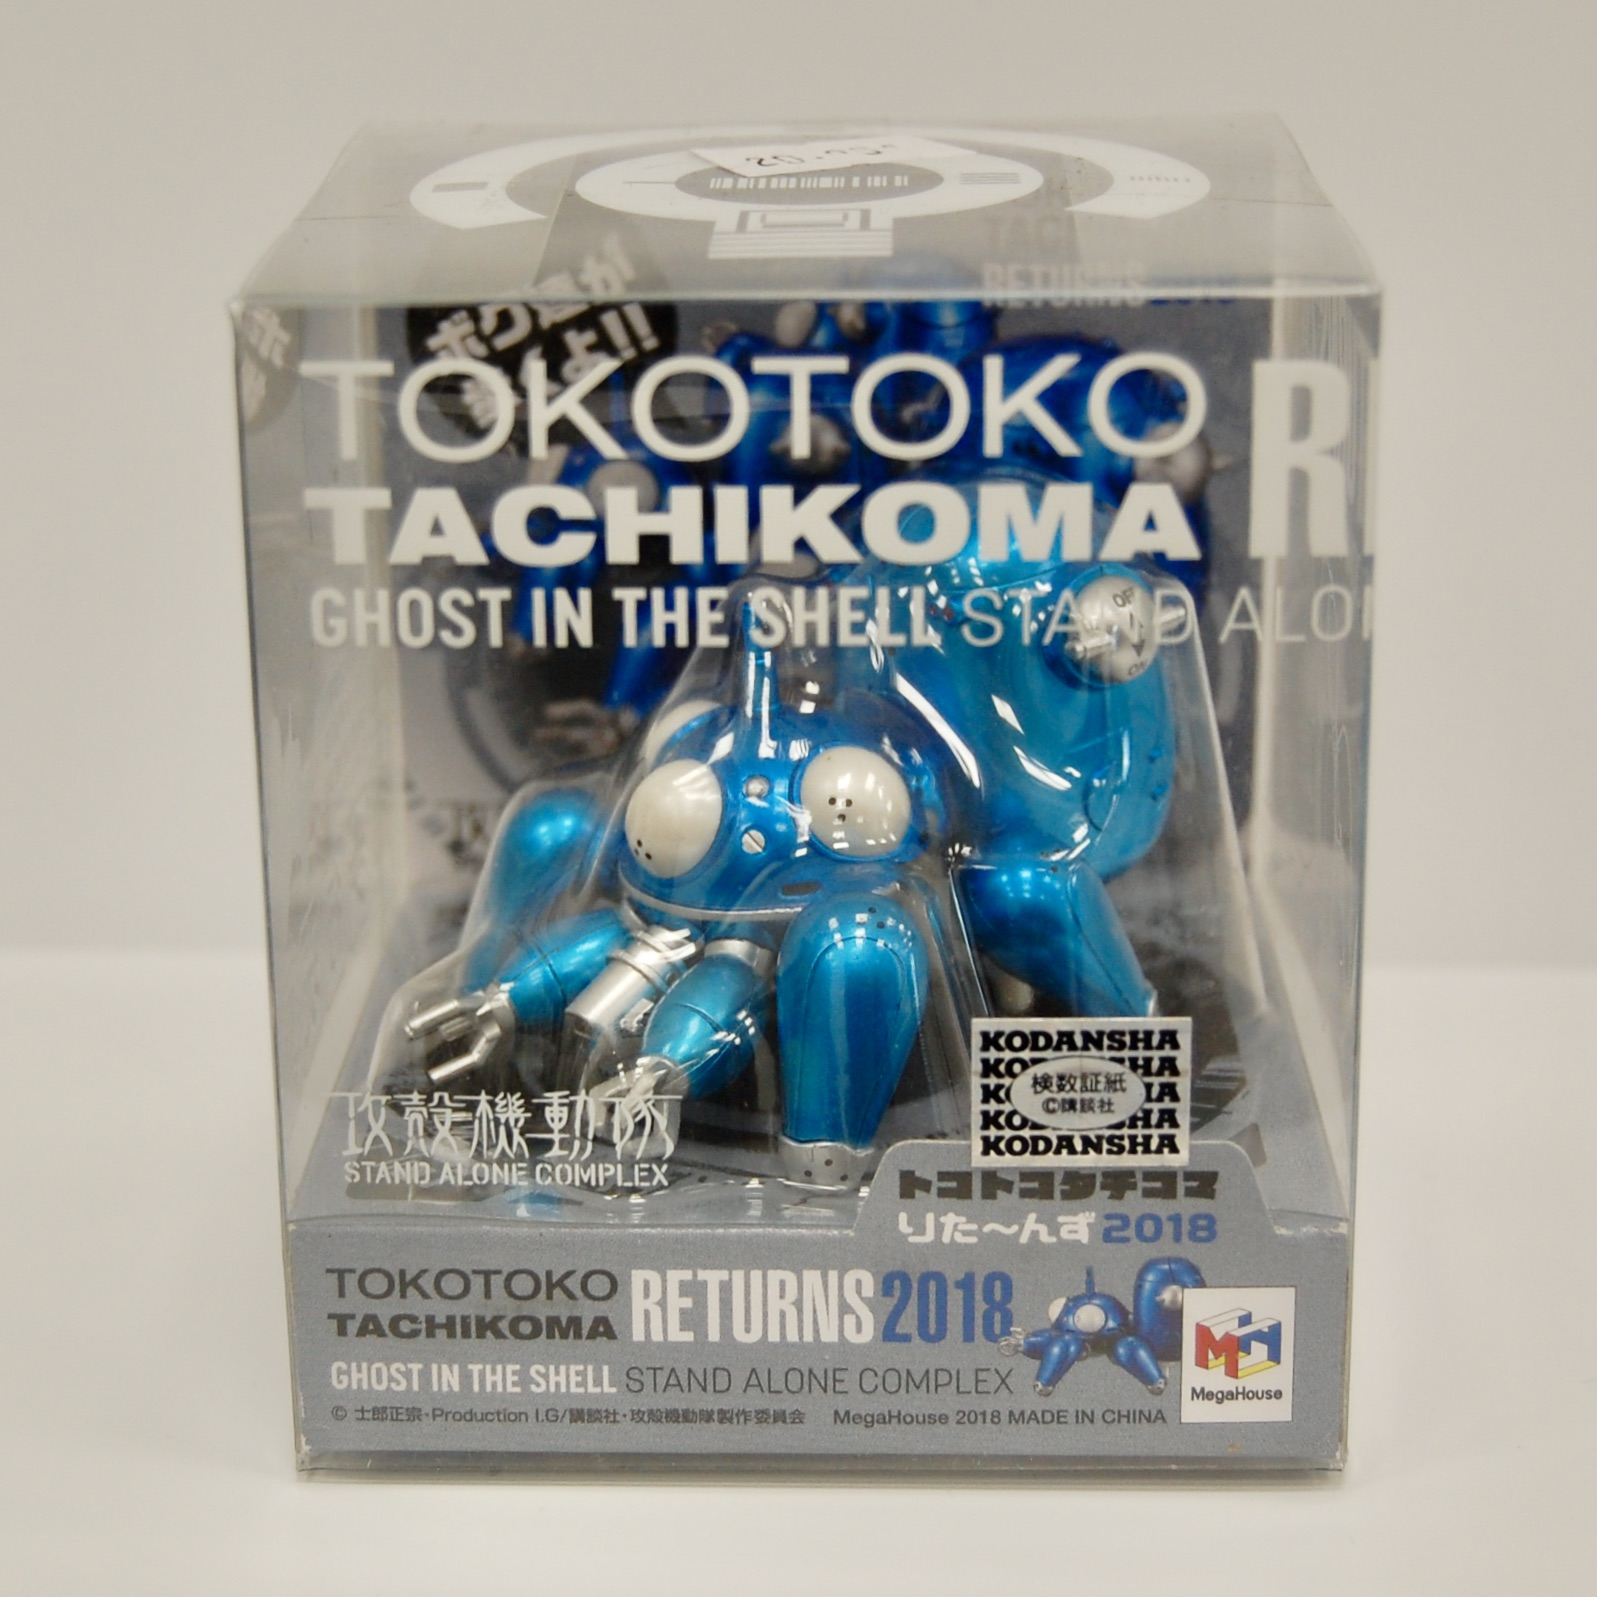 MegaHouse Tokotoko Tachikoma Returns 2018